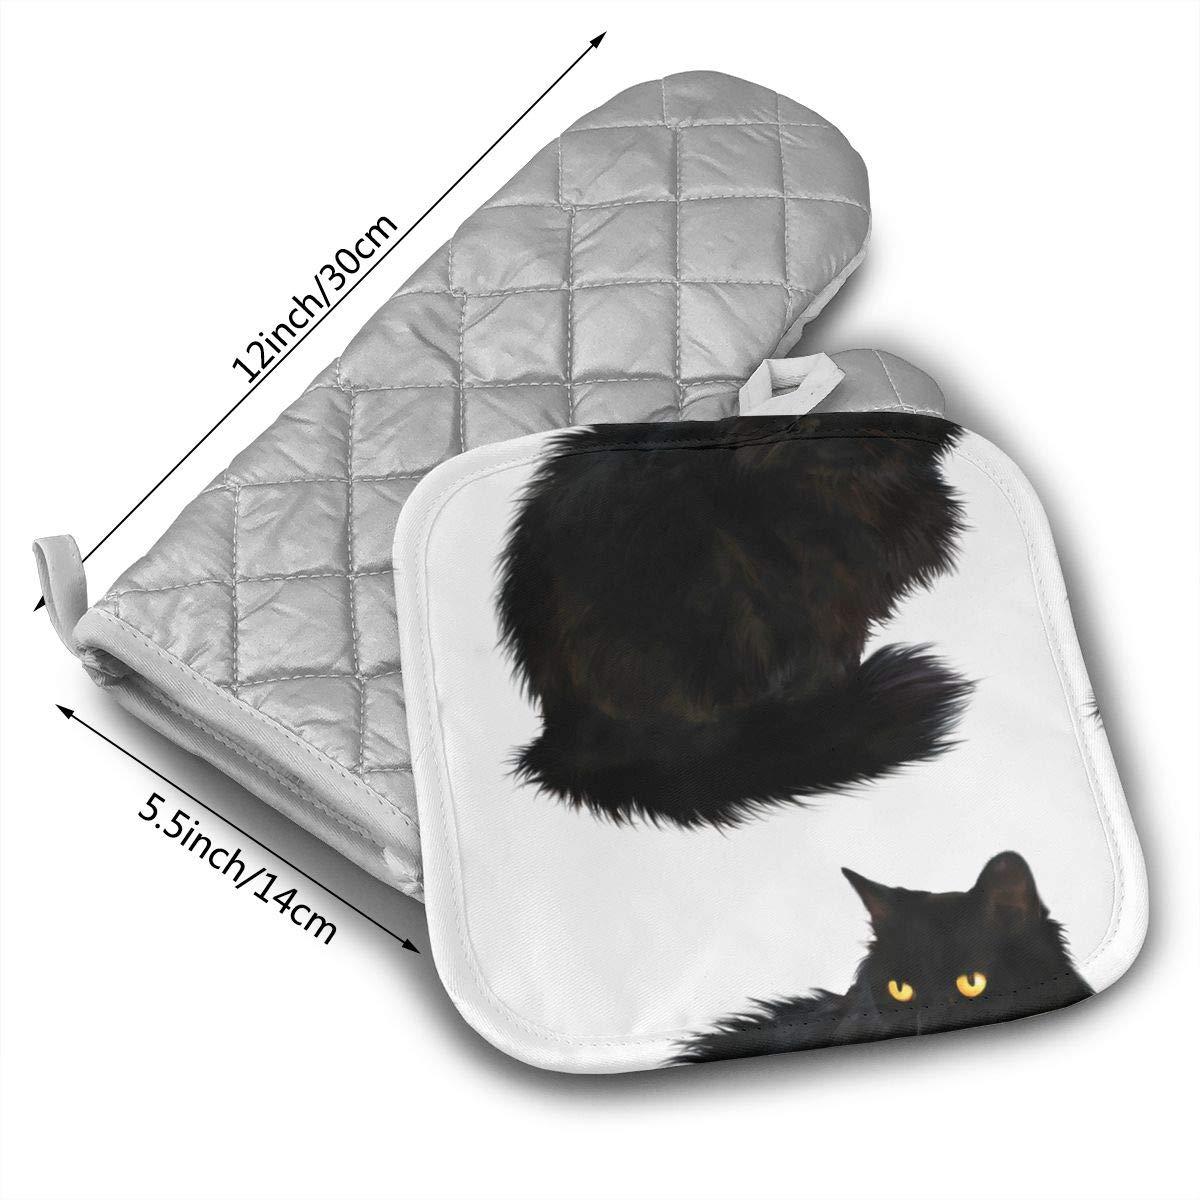 Amazon.com: UFKEOJ Halloween Black Cat Oven Mitts,BBQ ...